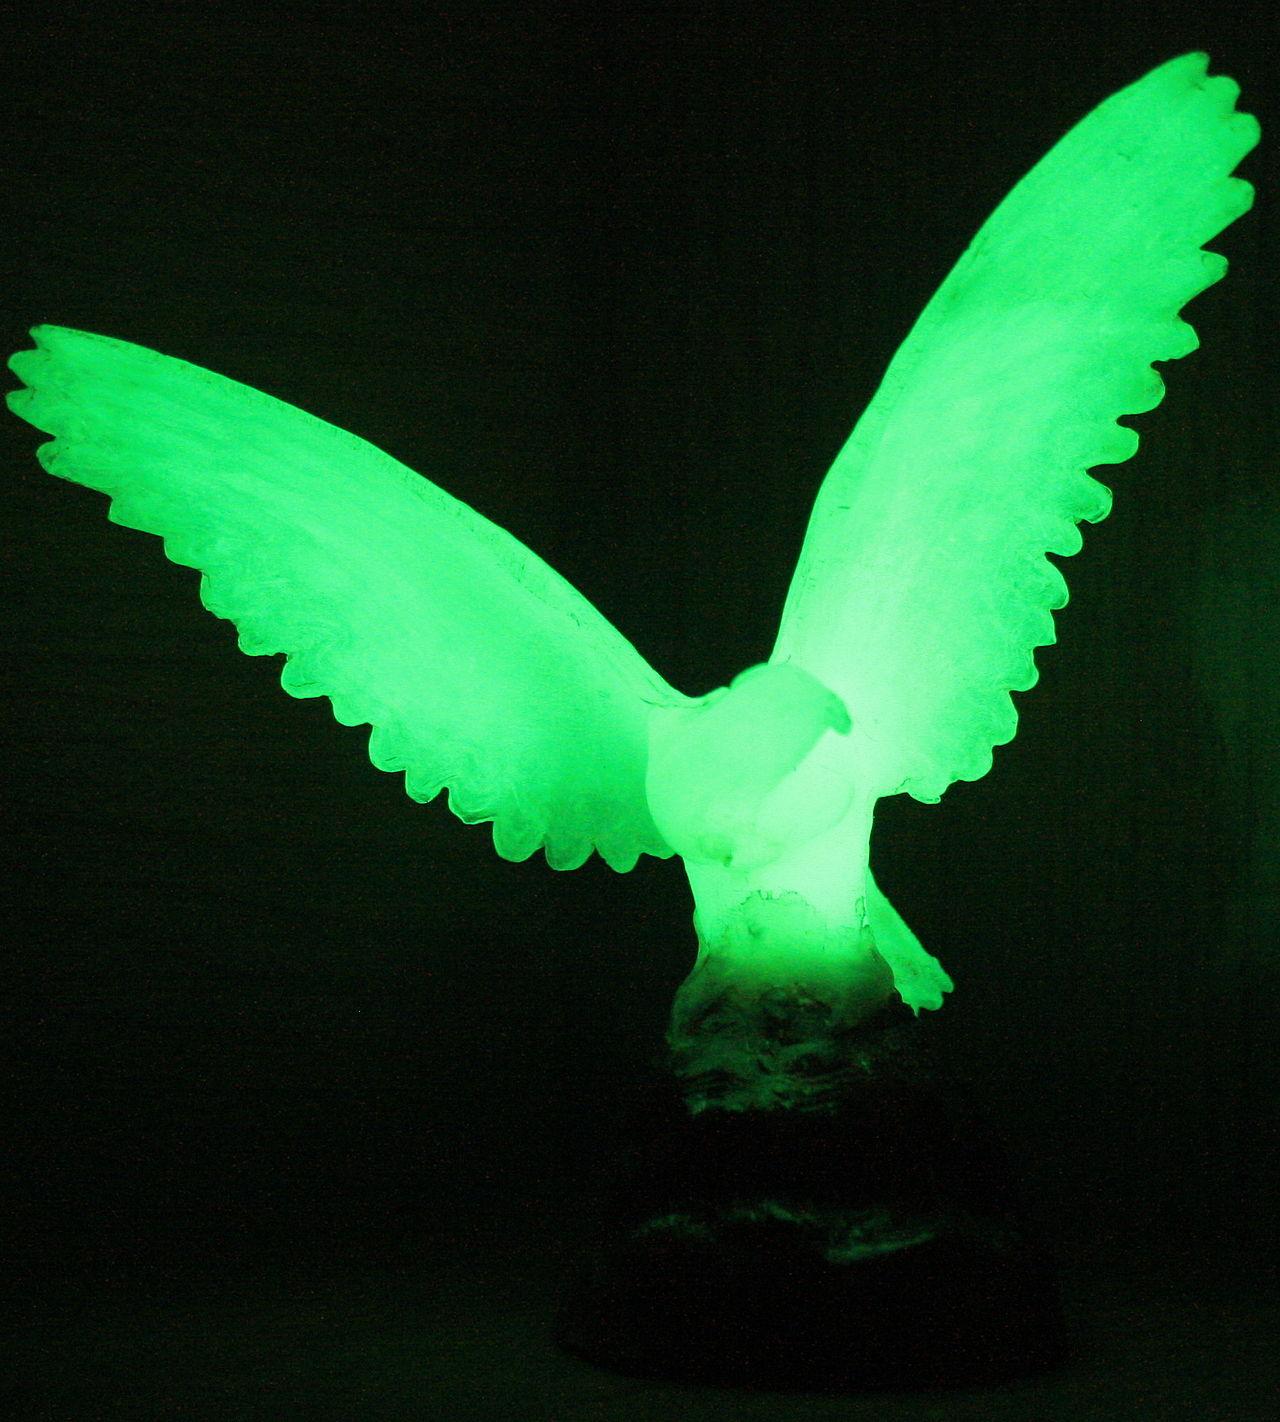 Glow in the dark bird figurine. Image credit: wikimedia user Lưu Ly, public domain.